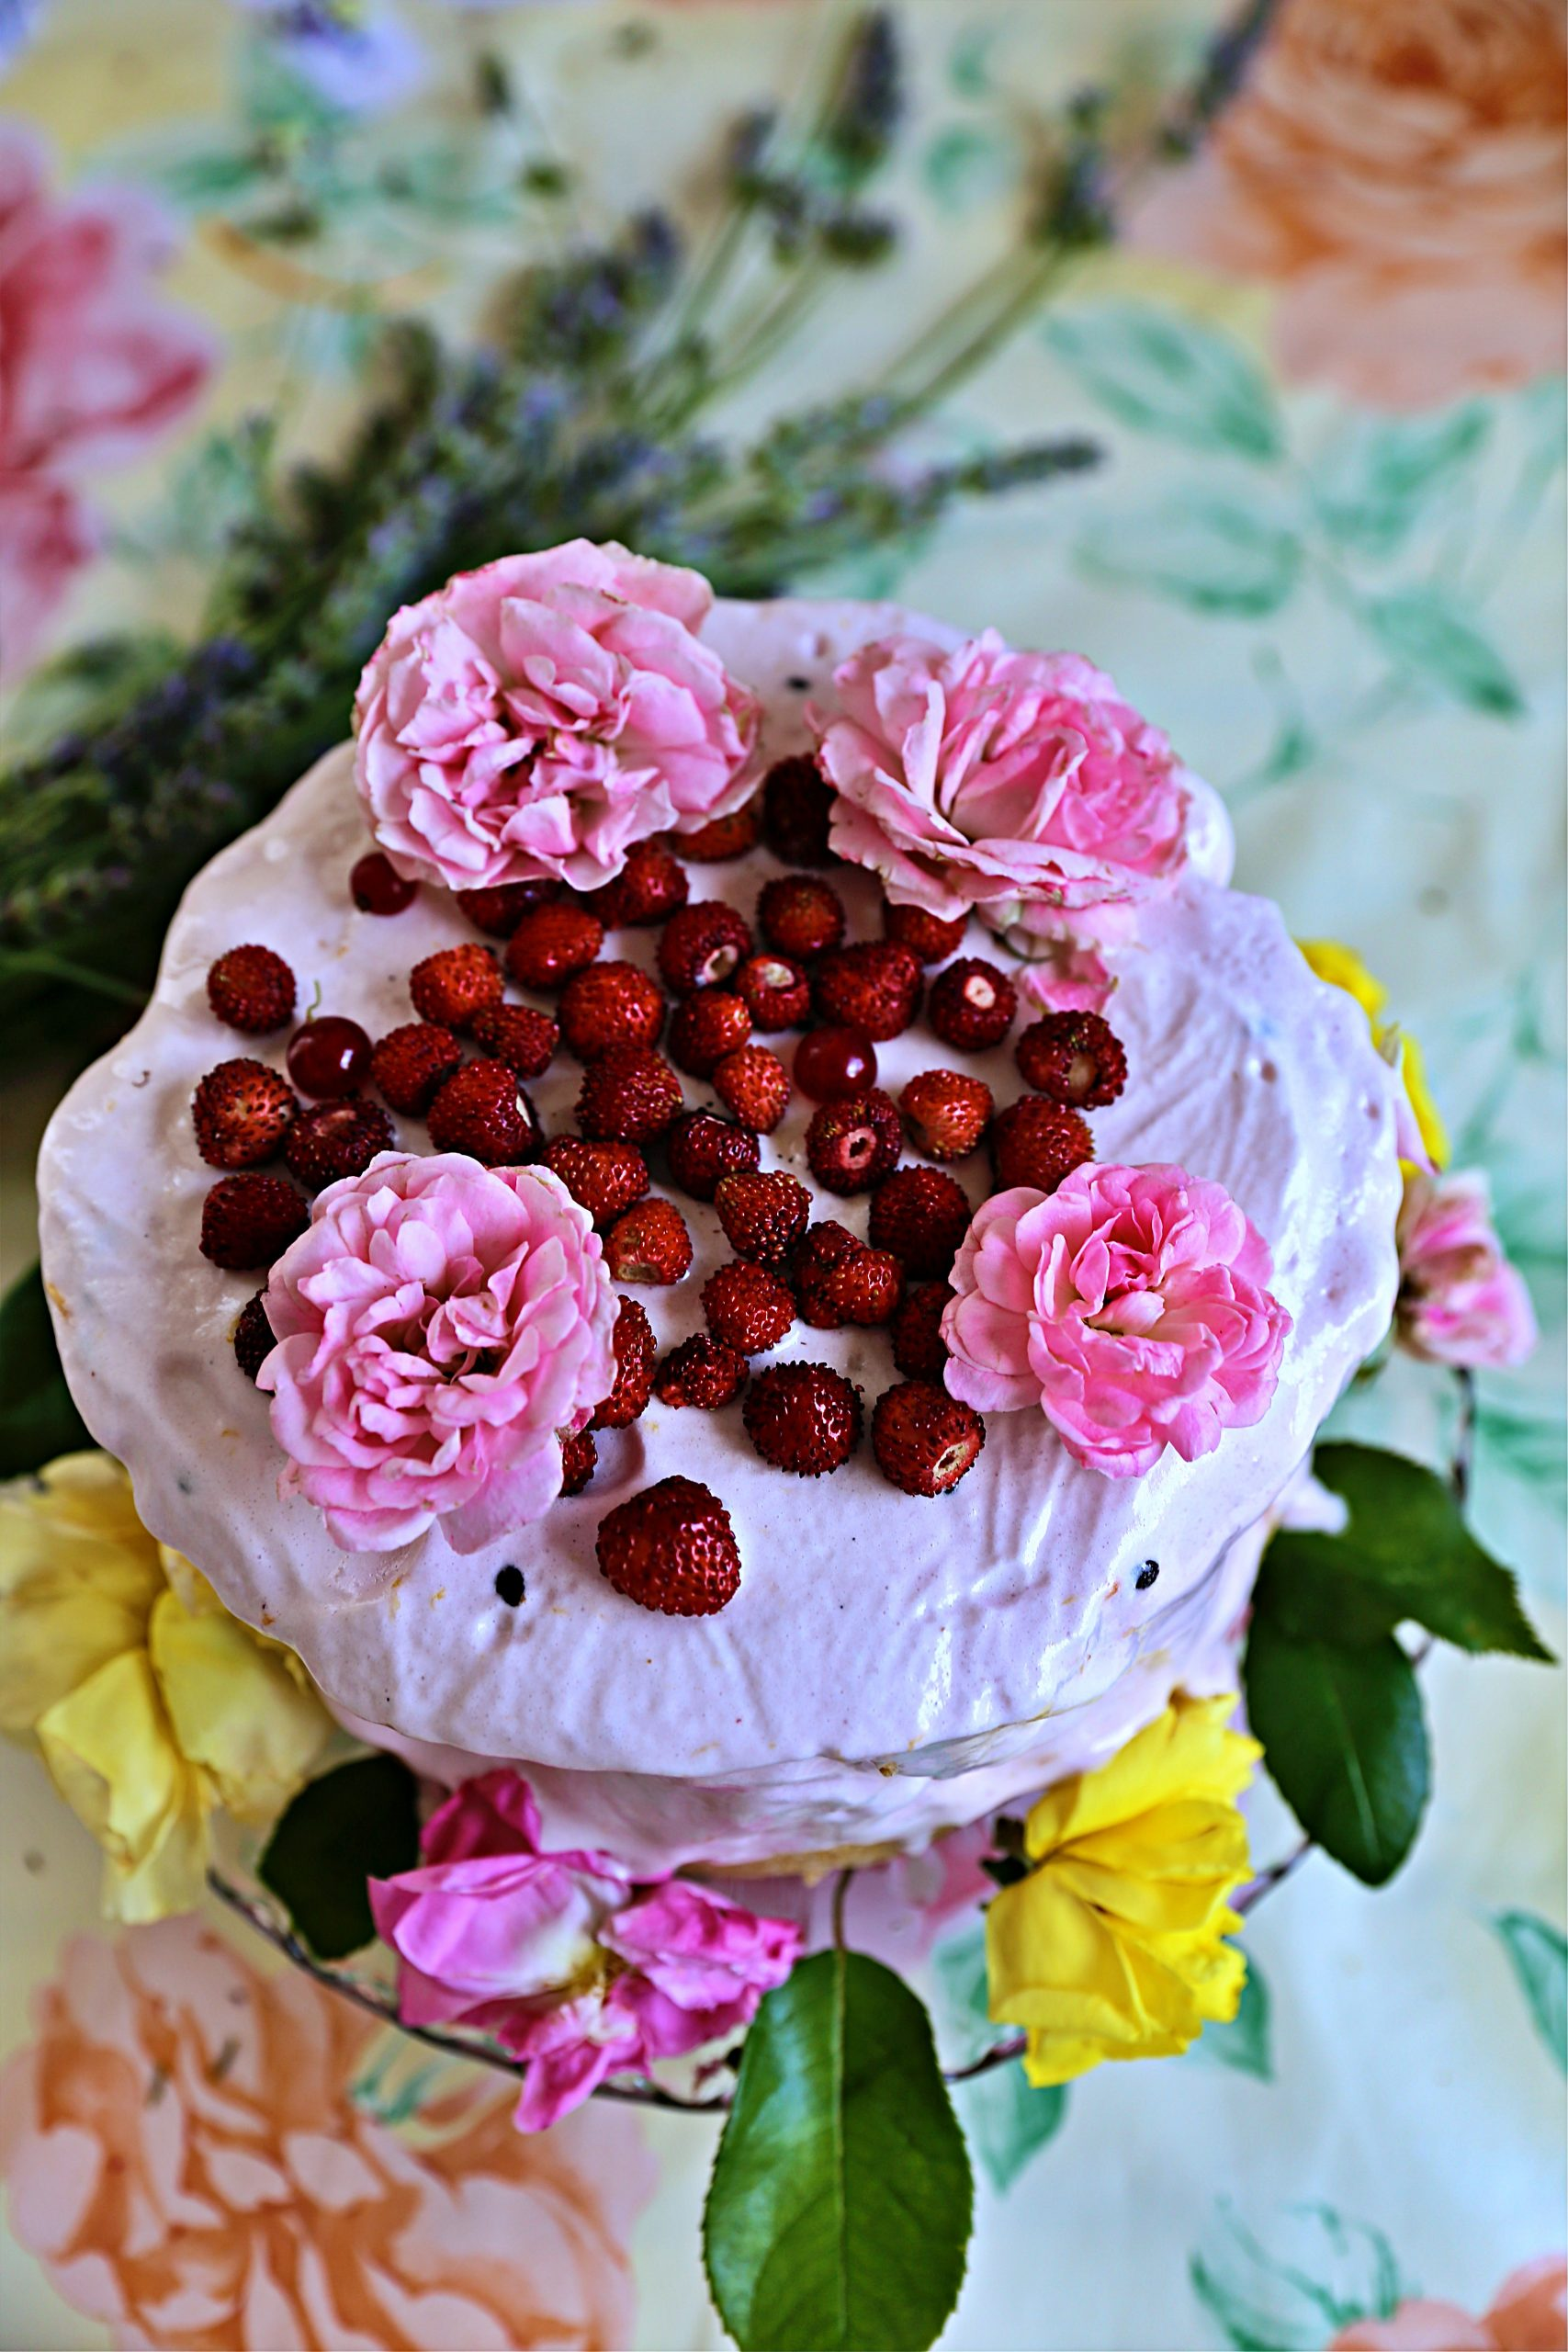 strawberry and rose cake pic: Kerstin rodgers/msmarmitelover.com